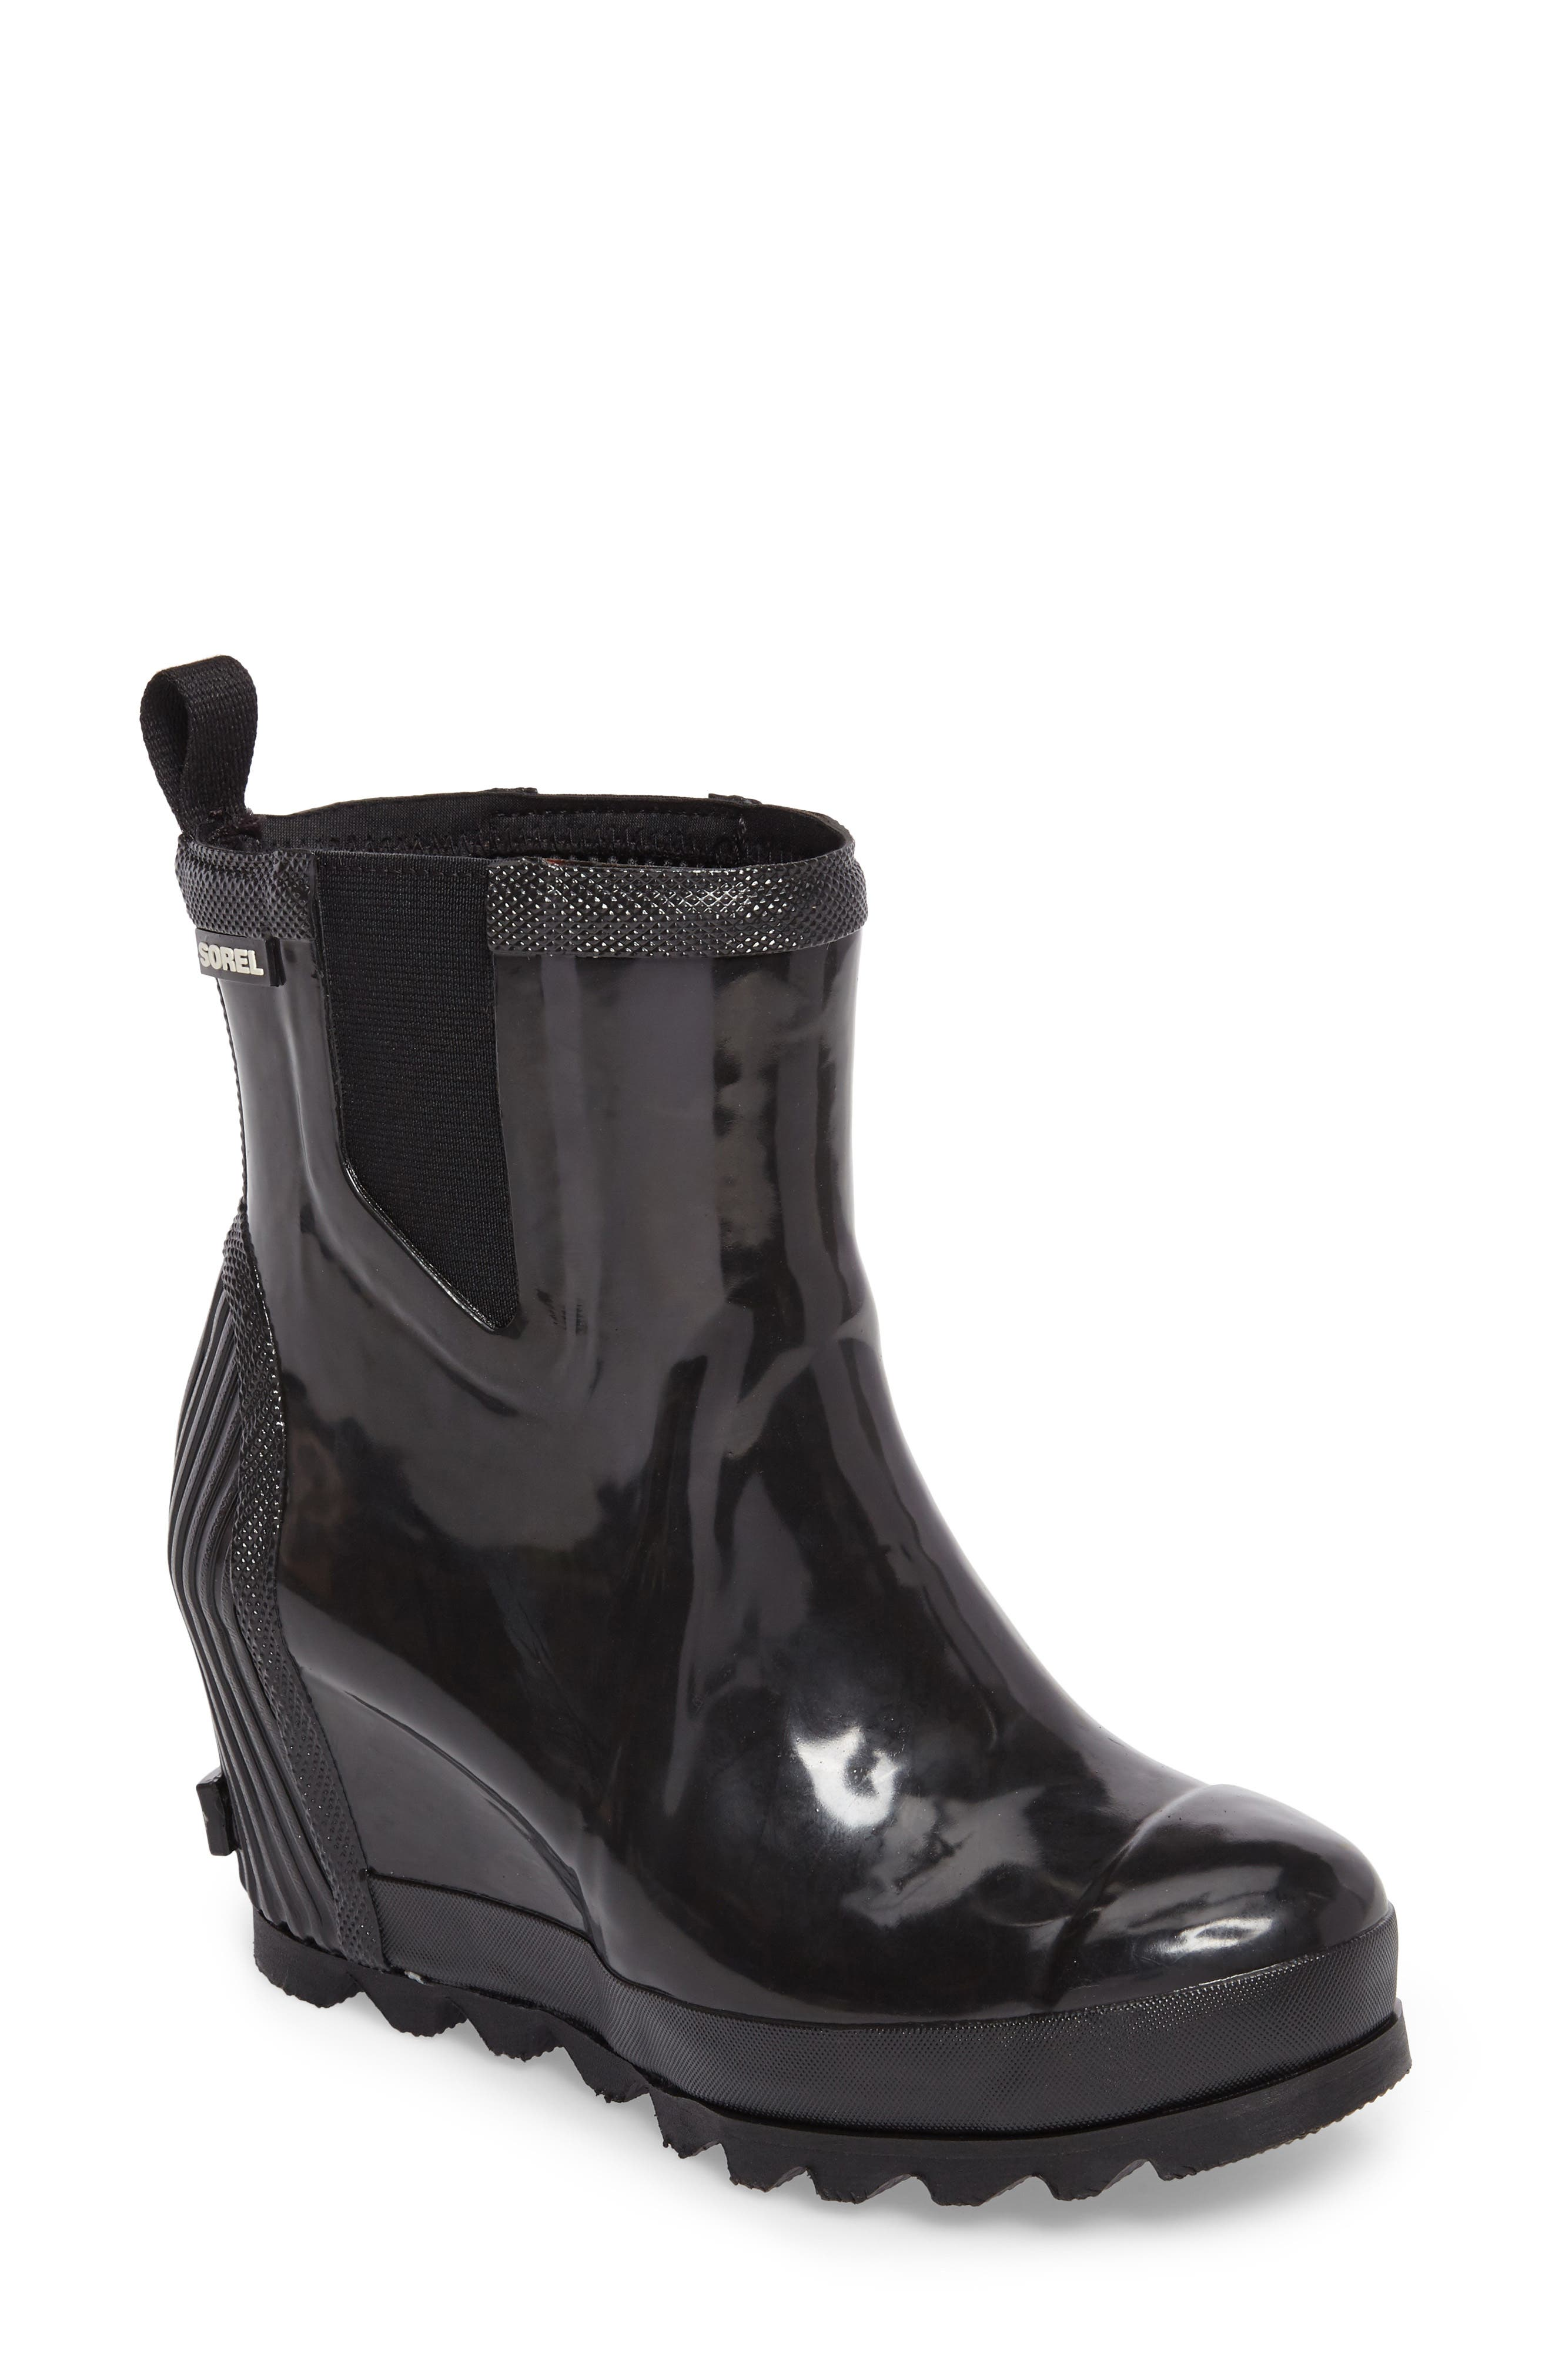 Joan Glossy Wedge Rain Boot,                             Main thumbnail 1, color,                             Black/ Sea Salt